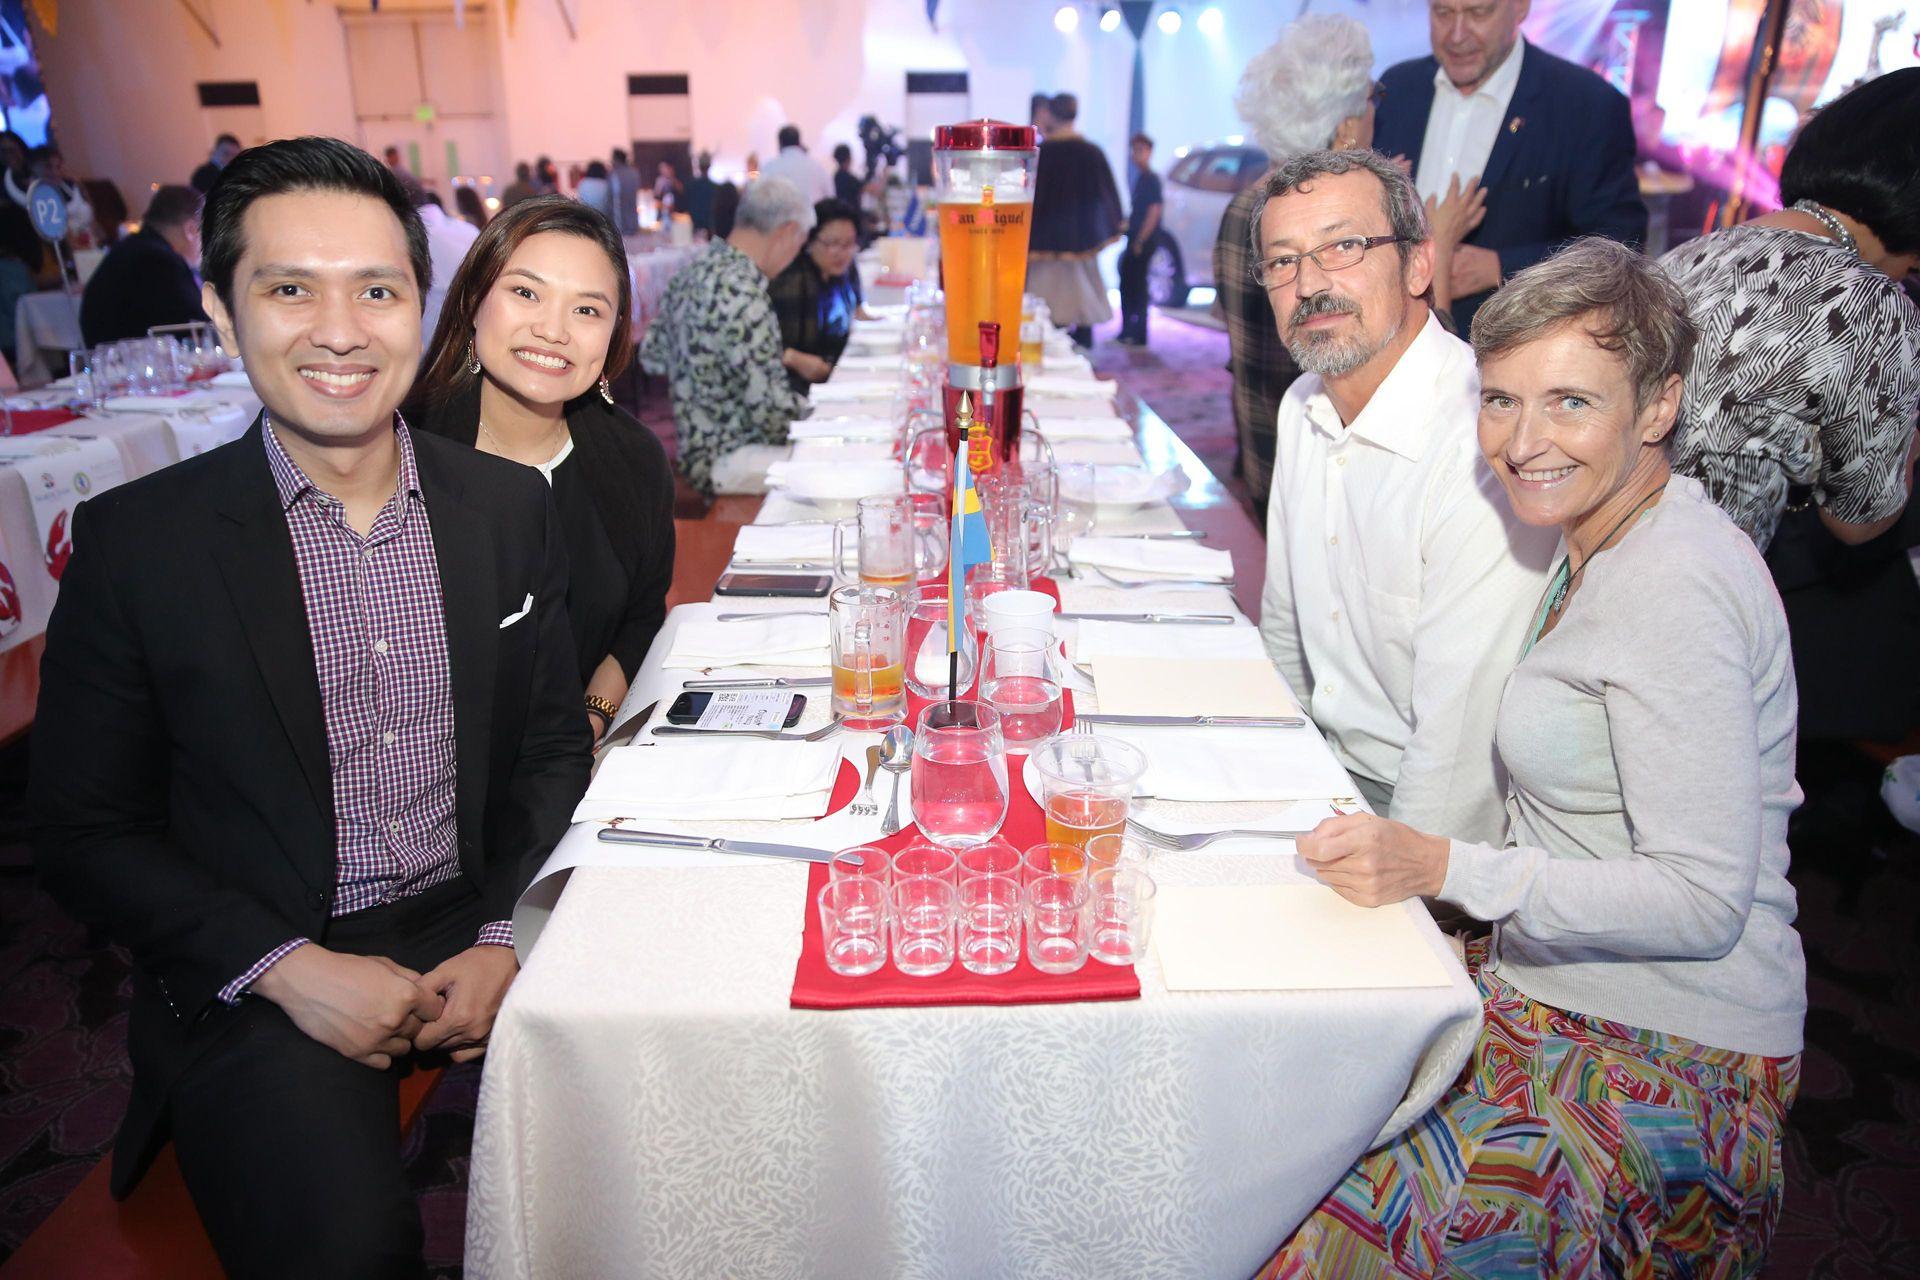 Paolo Ilustre, Ikea's HR Manager Diana Atienza, Ikea  Philippines Market Development Manager Georg Platzer and Tatjana Platzer